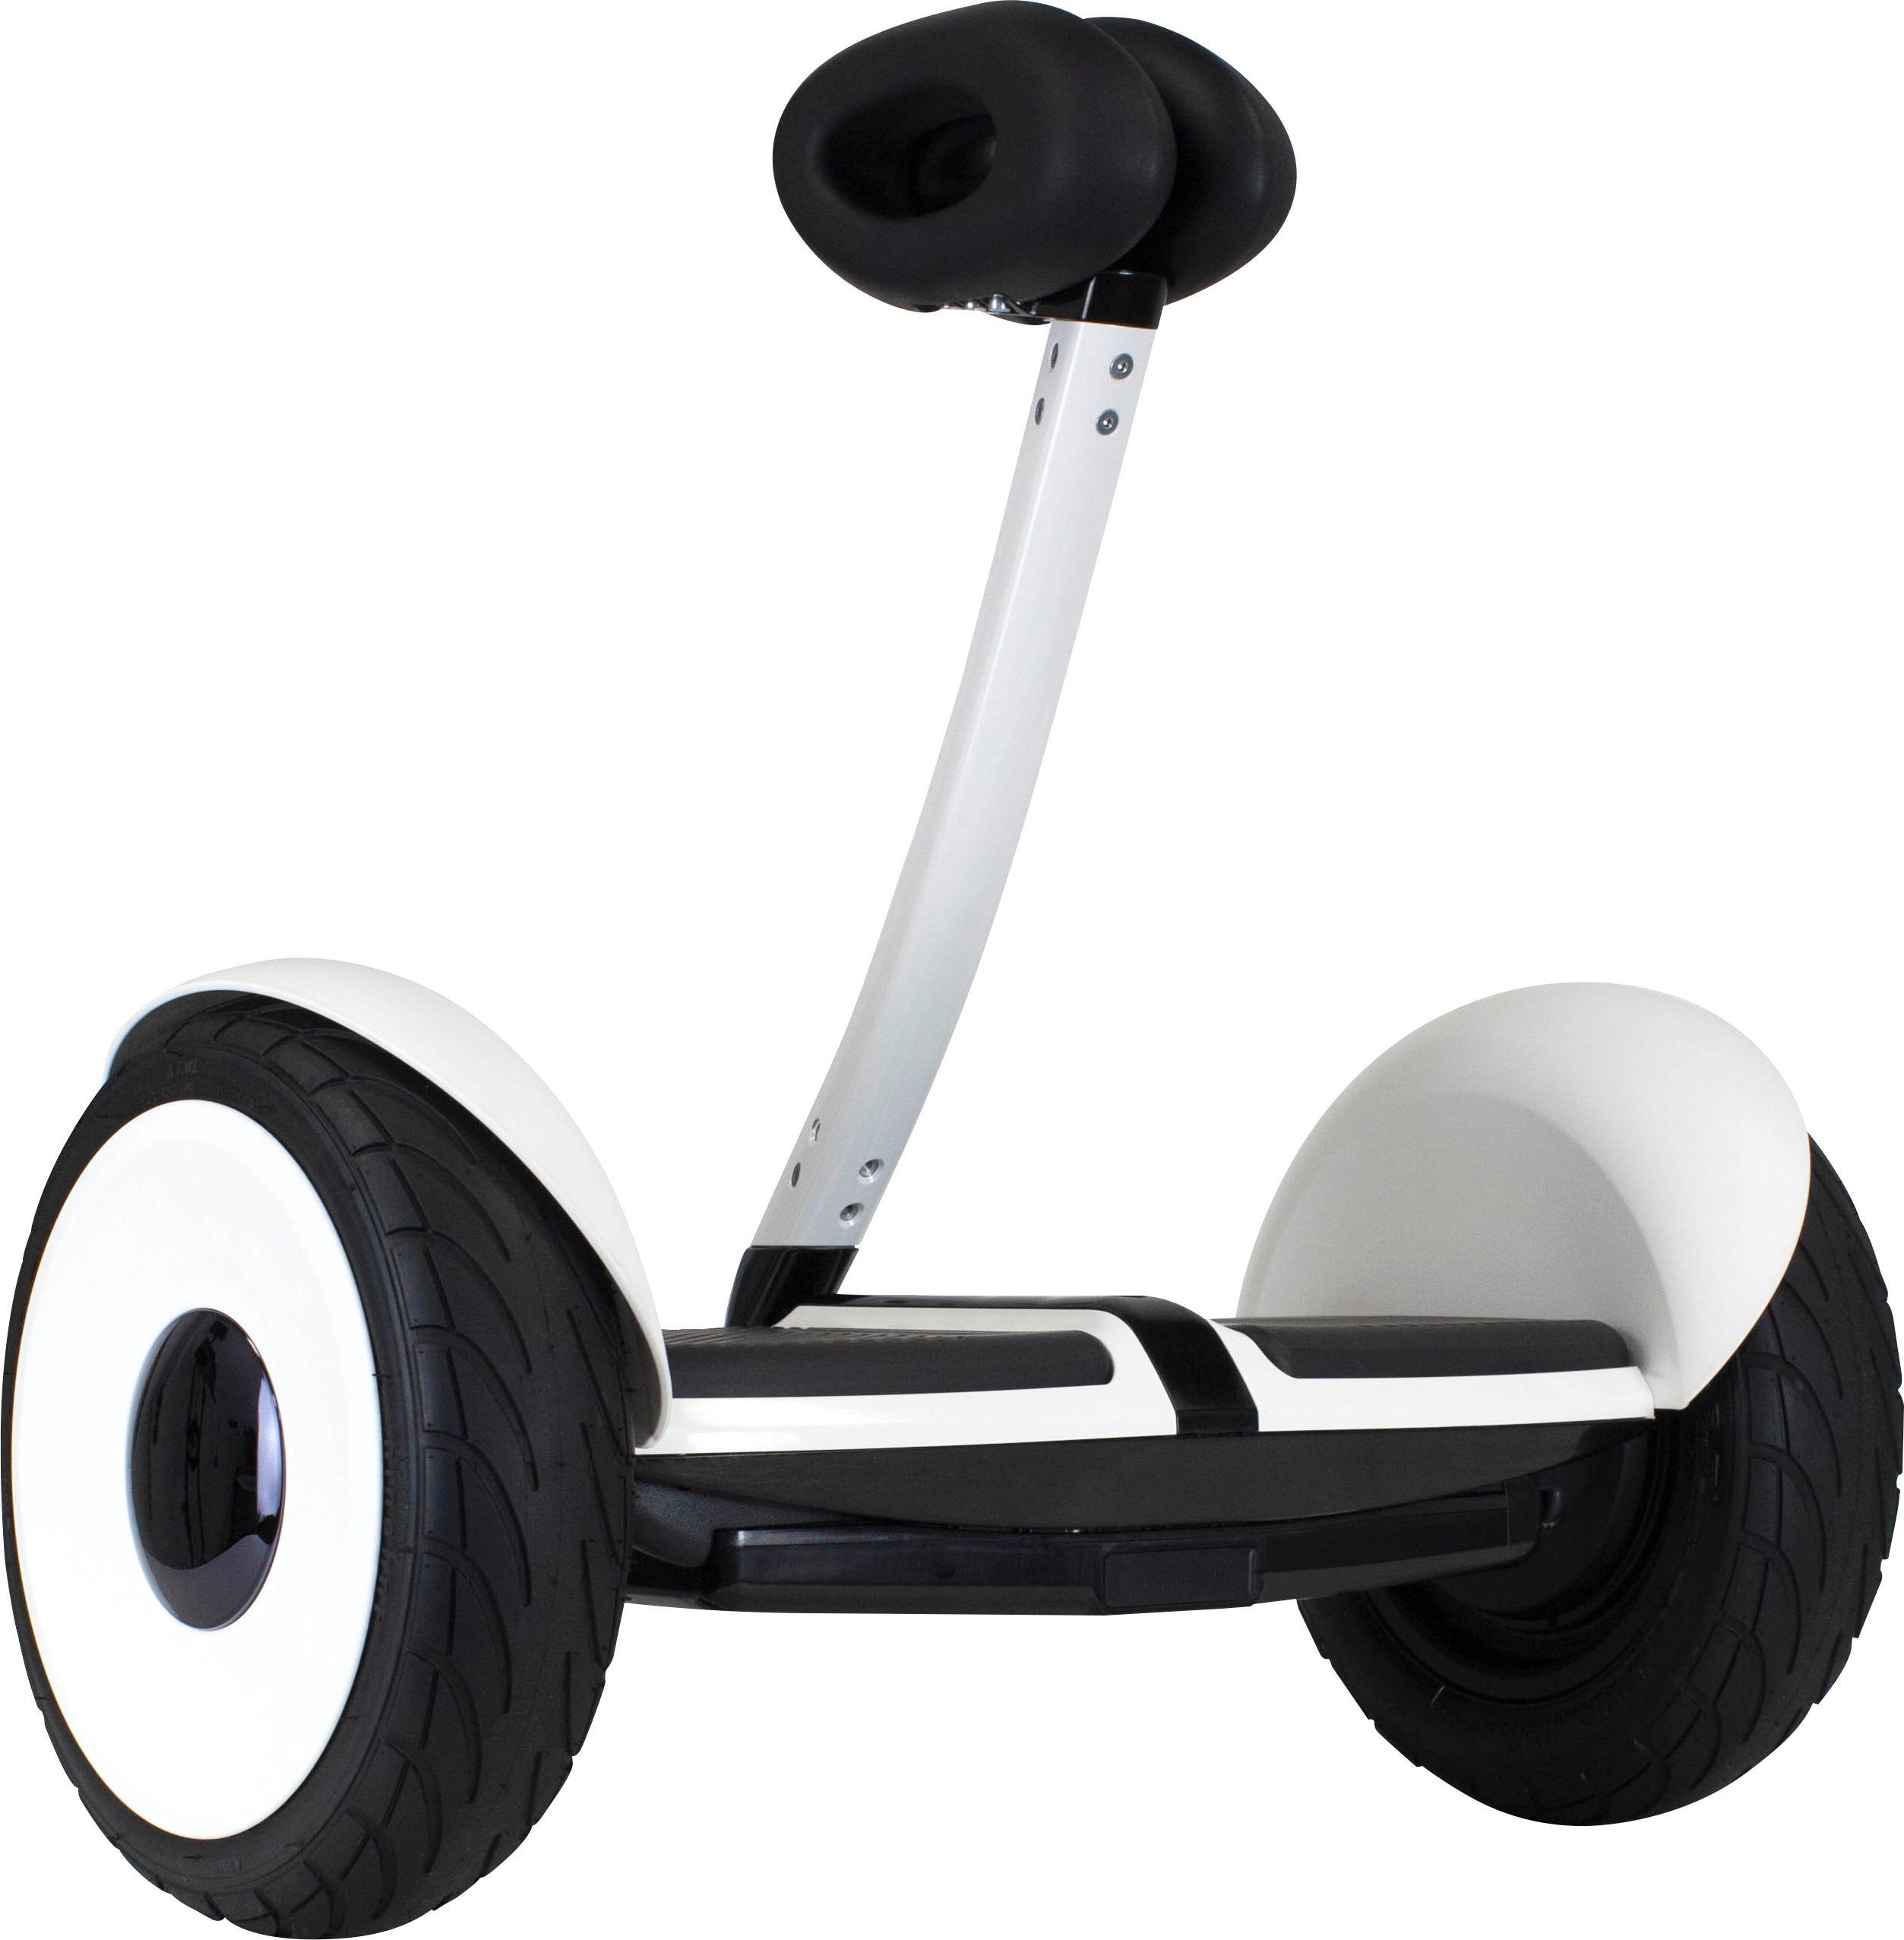 segway minilite self balancing scooter white hover. Black Bedroom Furniture Sets. Home Design Ideas